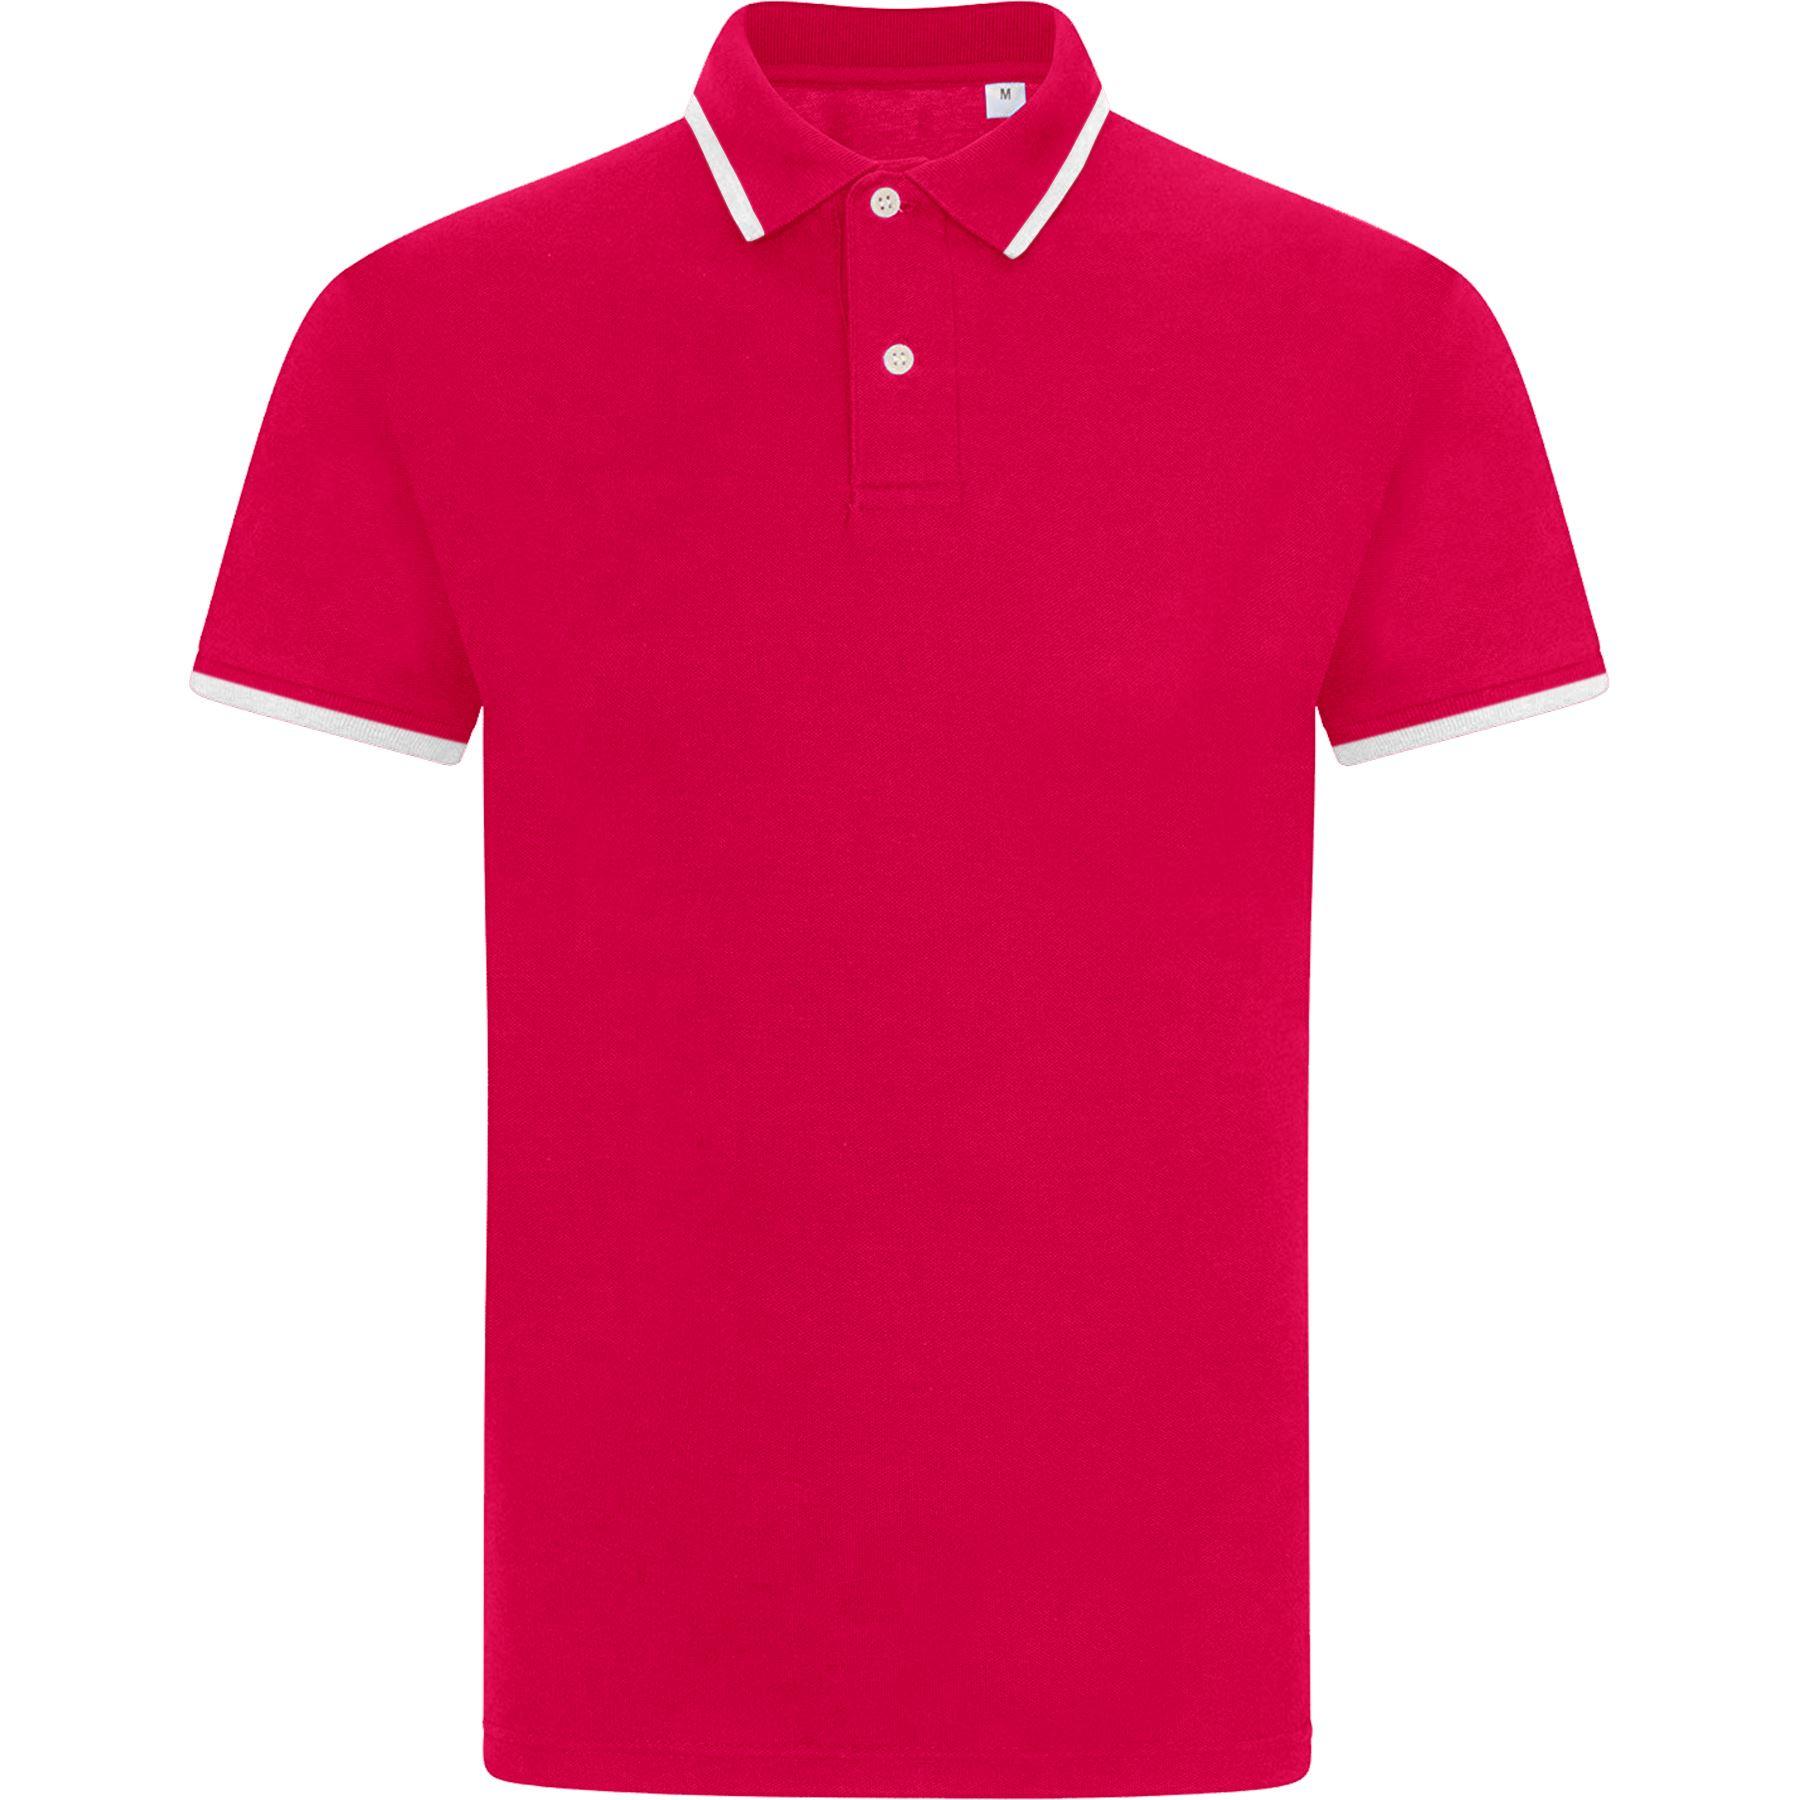 Mens-Tipping-Polo-Shirt-Ultra-Cotton-Blend-Plain-Pique-Casual-Summer-Top-T-Shirt thumbnail 3